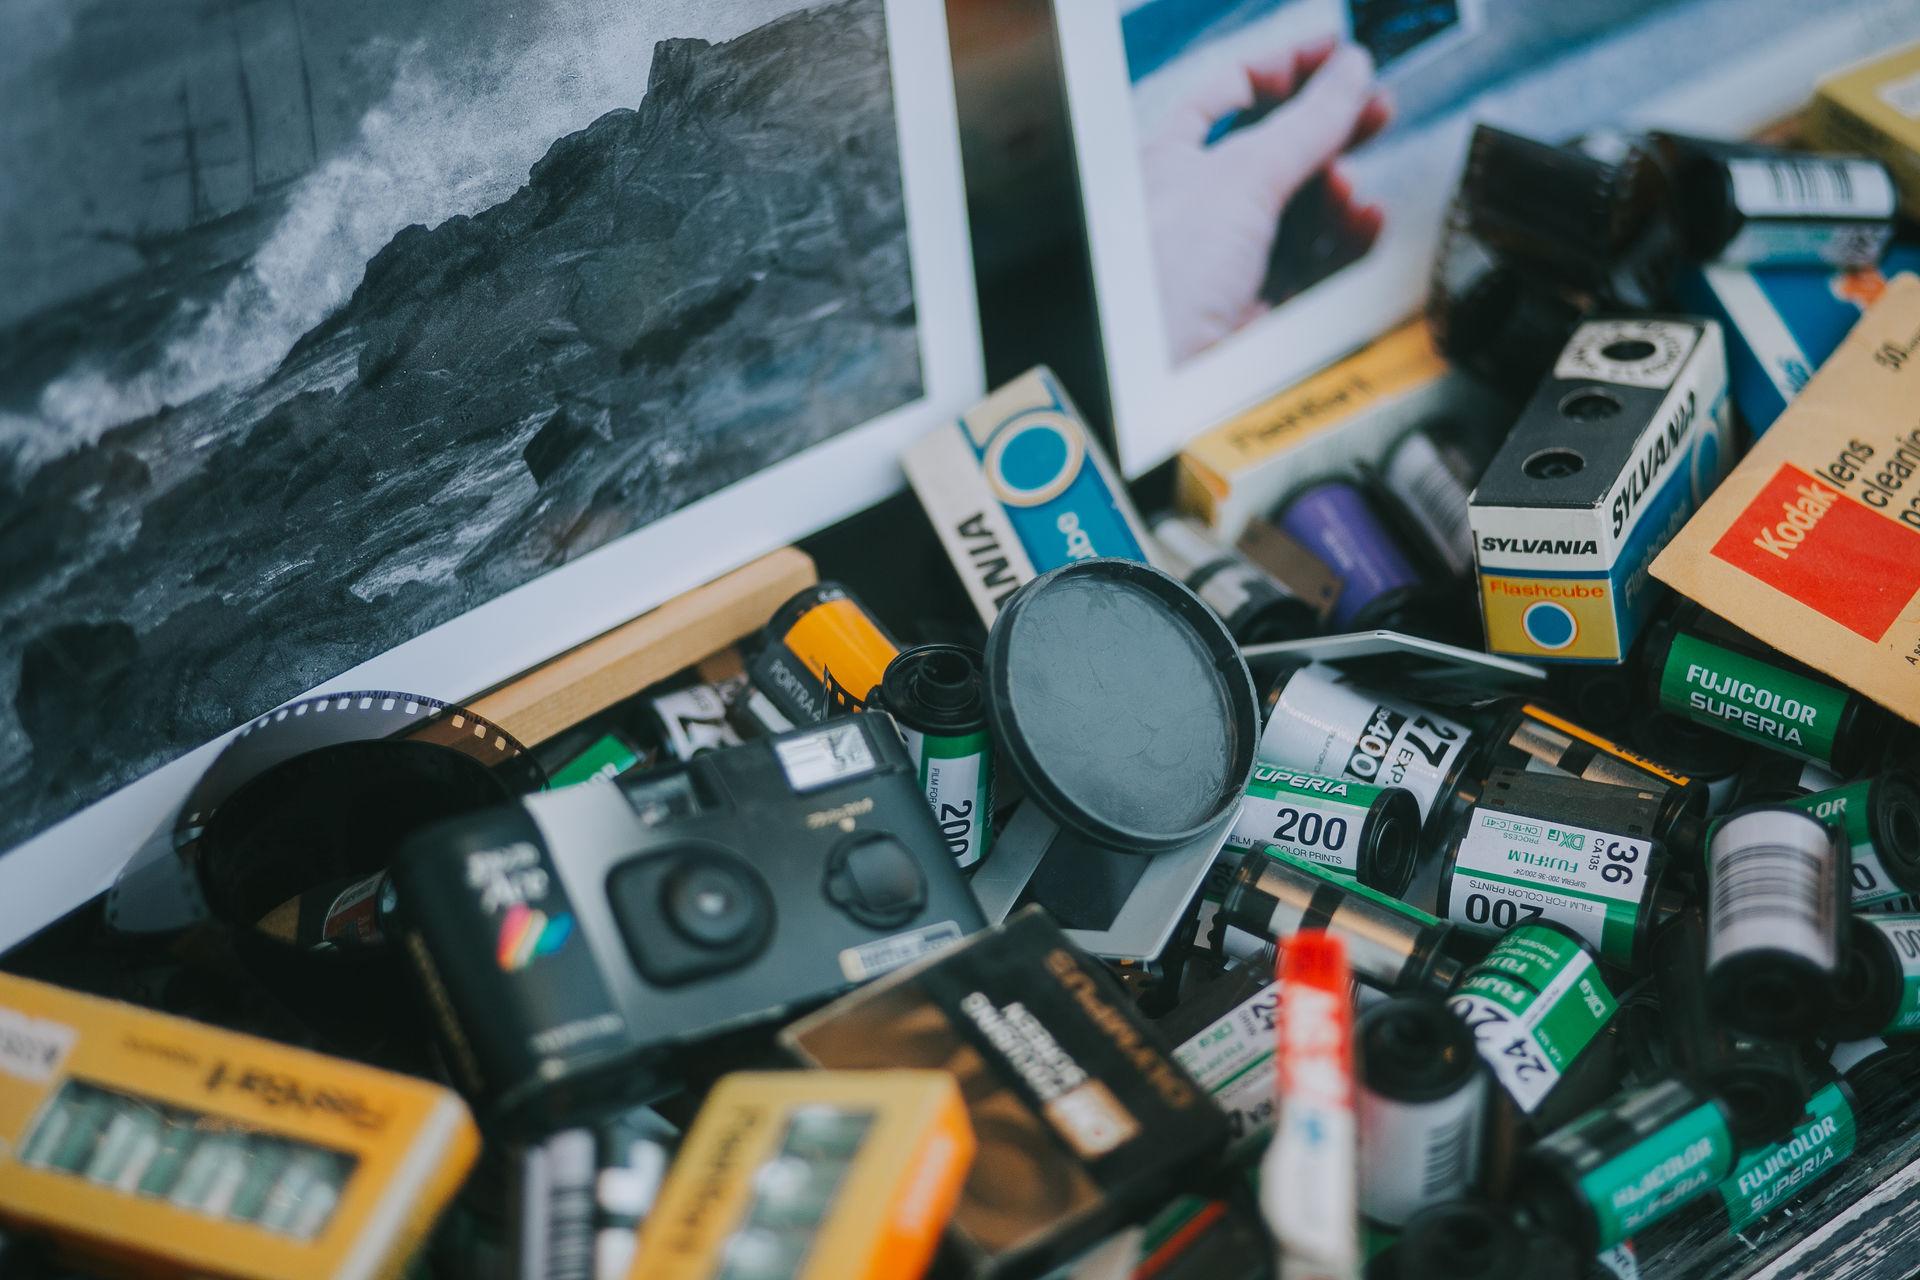 Antique Camera Film Kodak Konica Memories canon close-up day gift multi colored oldschool photo technology